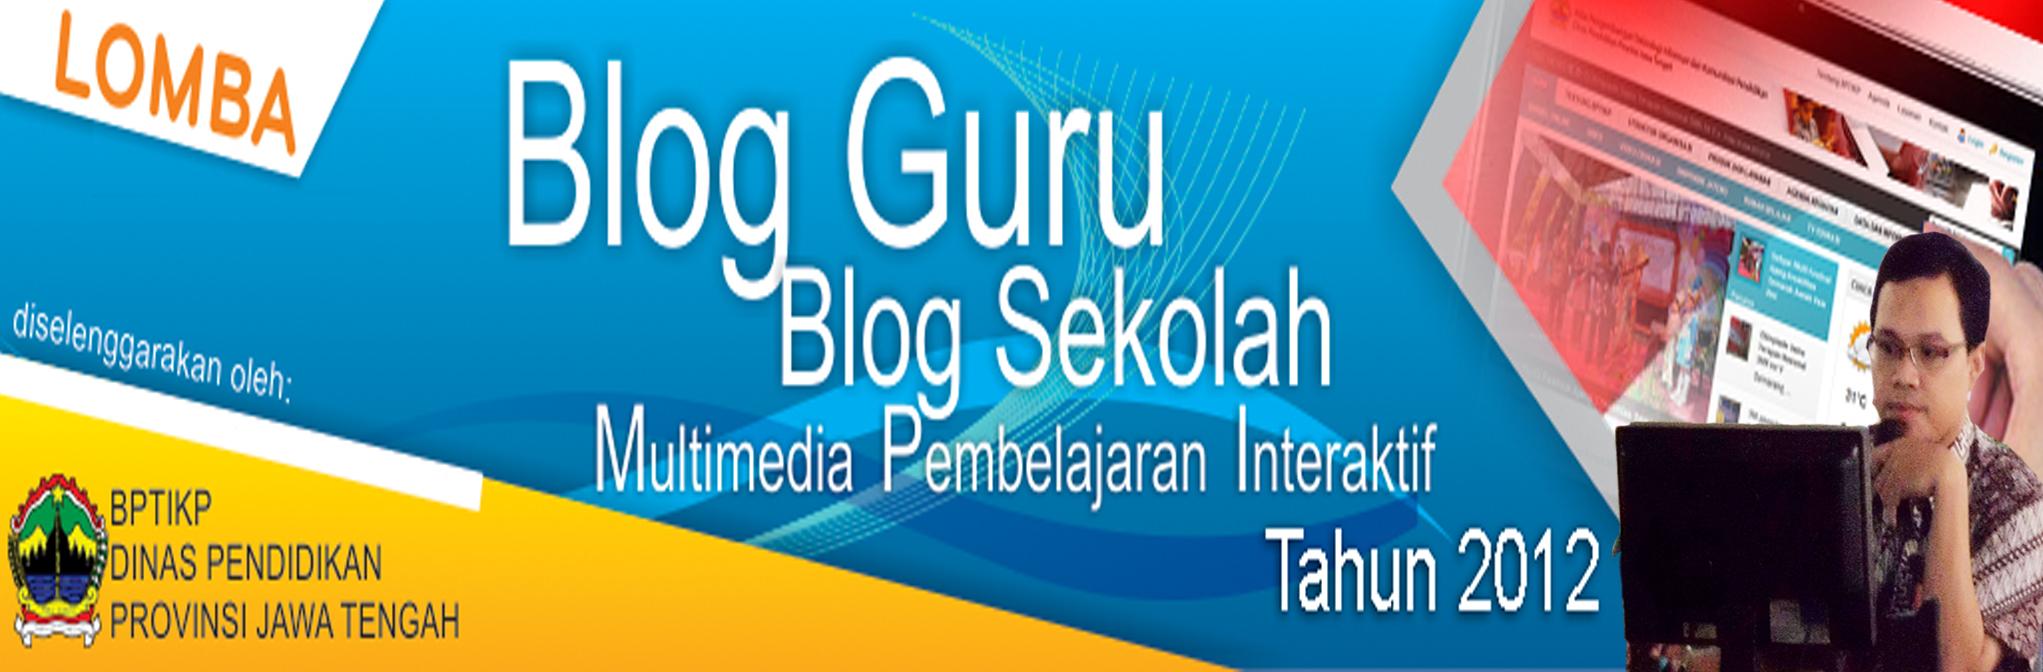 Mediaku Peringkat 5 Jawa Tengah